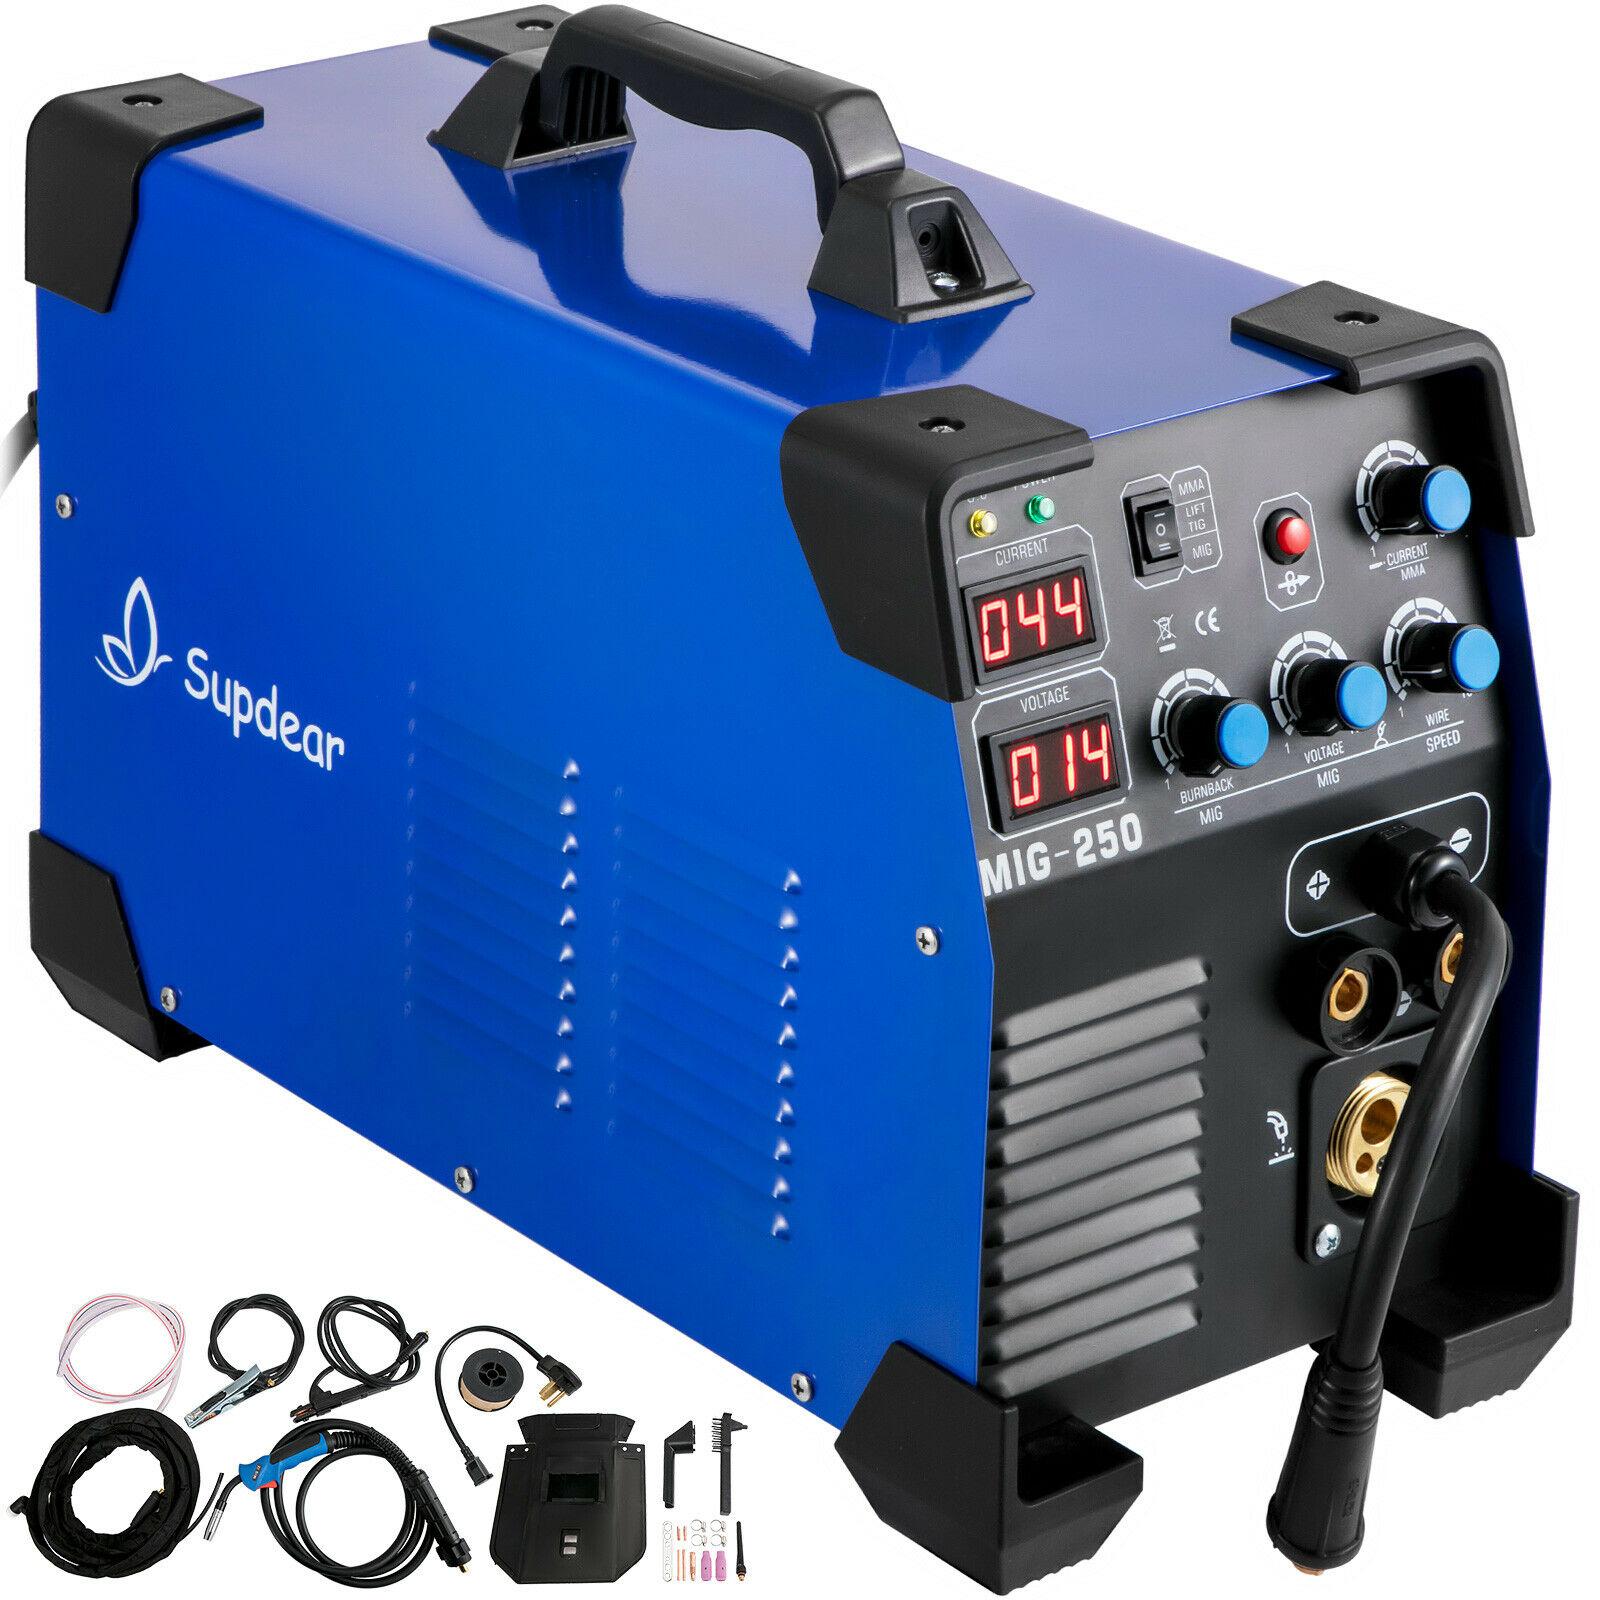 Welder 250 Amp MIG TIG Arc Welder 3 in 1 Welder Welding Machine 220V/110V TIG  Lift ARC  MMA Stick IGBT DC Inverter Dual voltage